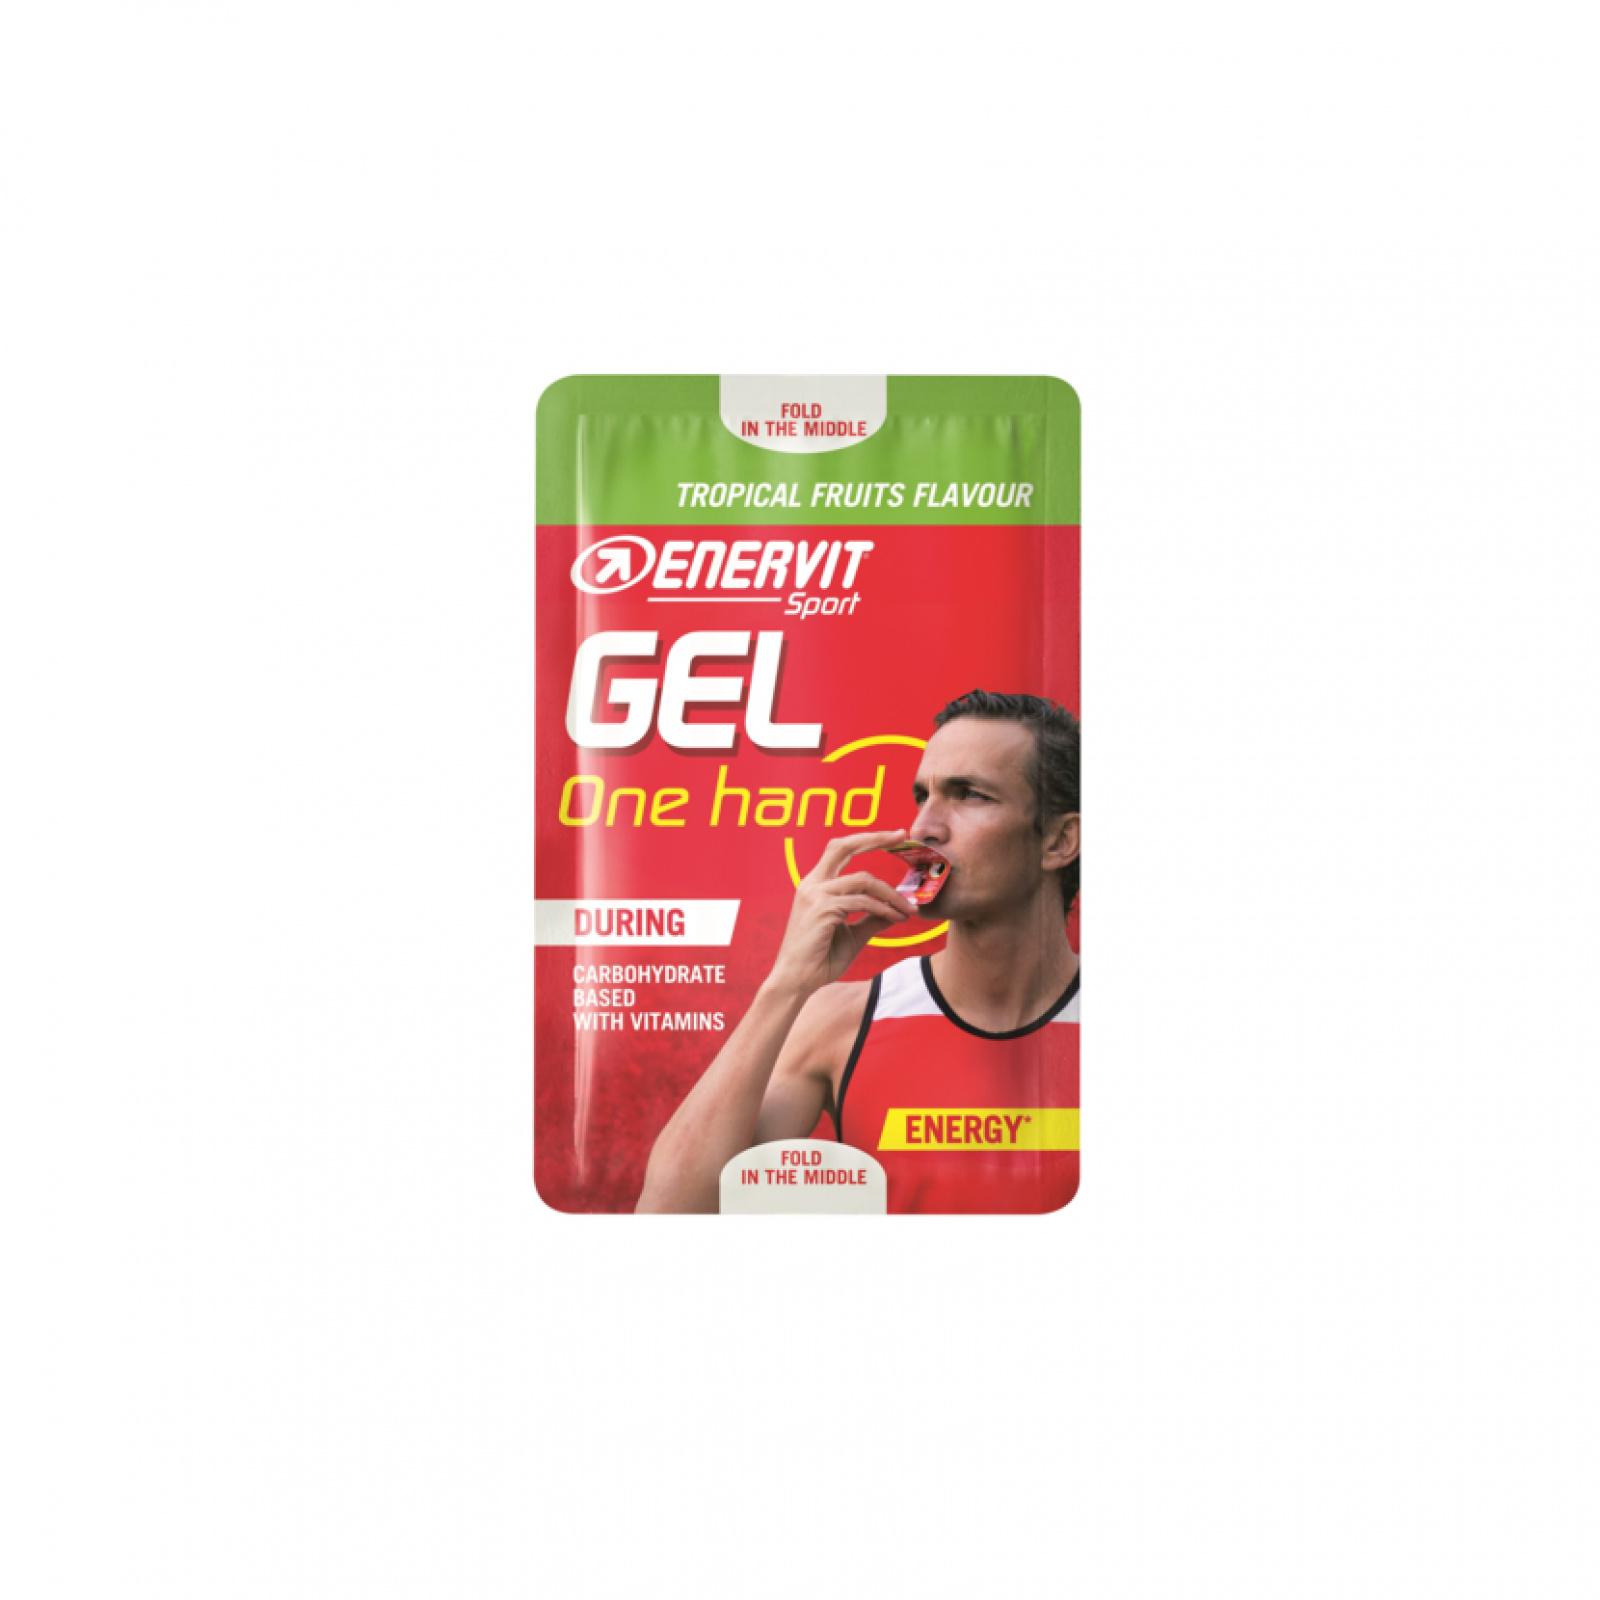 https://www.badec.store/produkty_img/enervit-gel-one-hand1602783053L.png